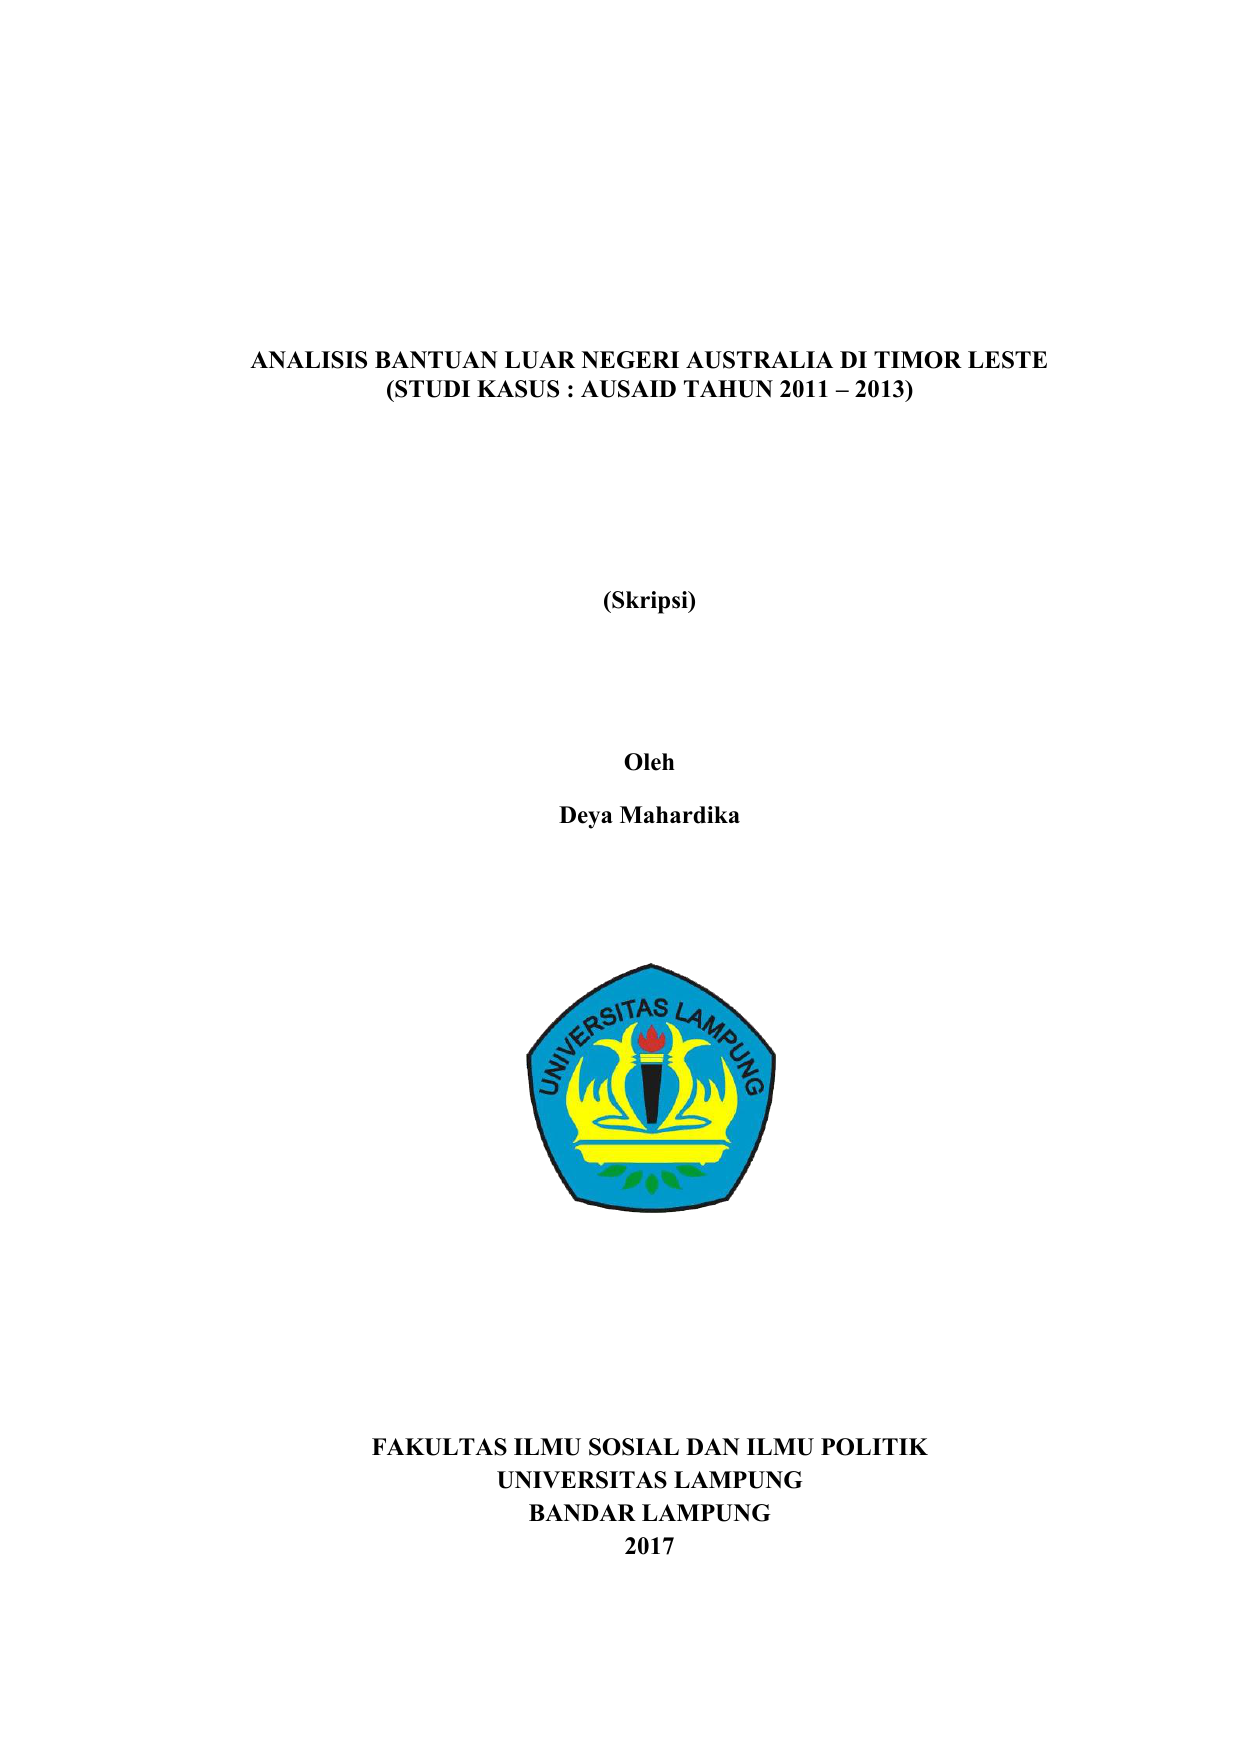 Analisis Bantuan Luar Negeri Australia Di Timor Leste